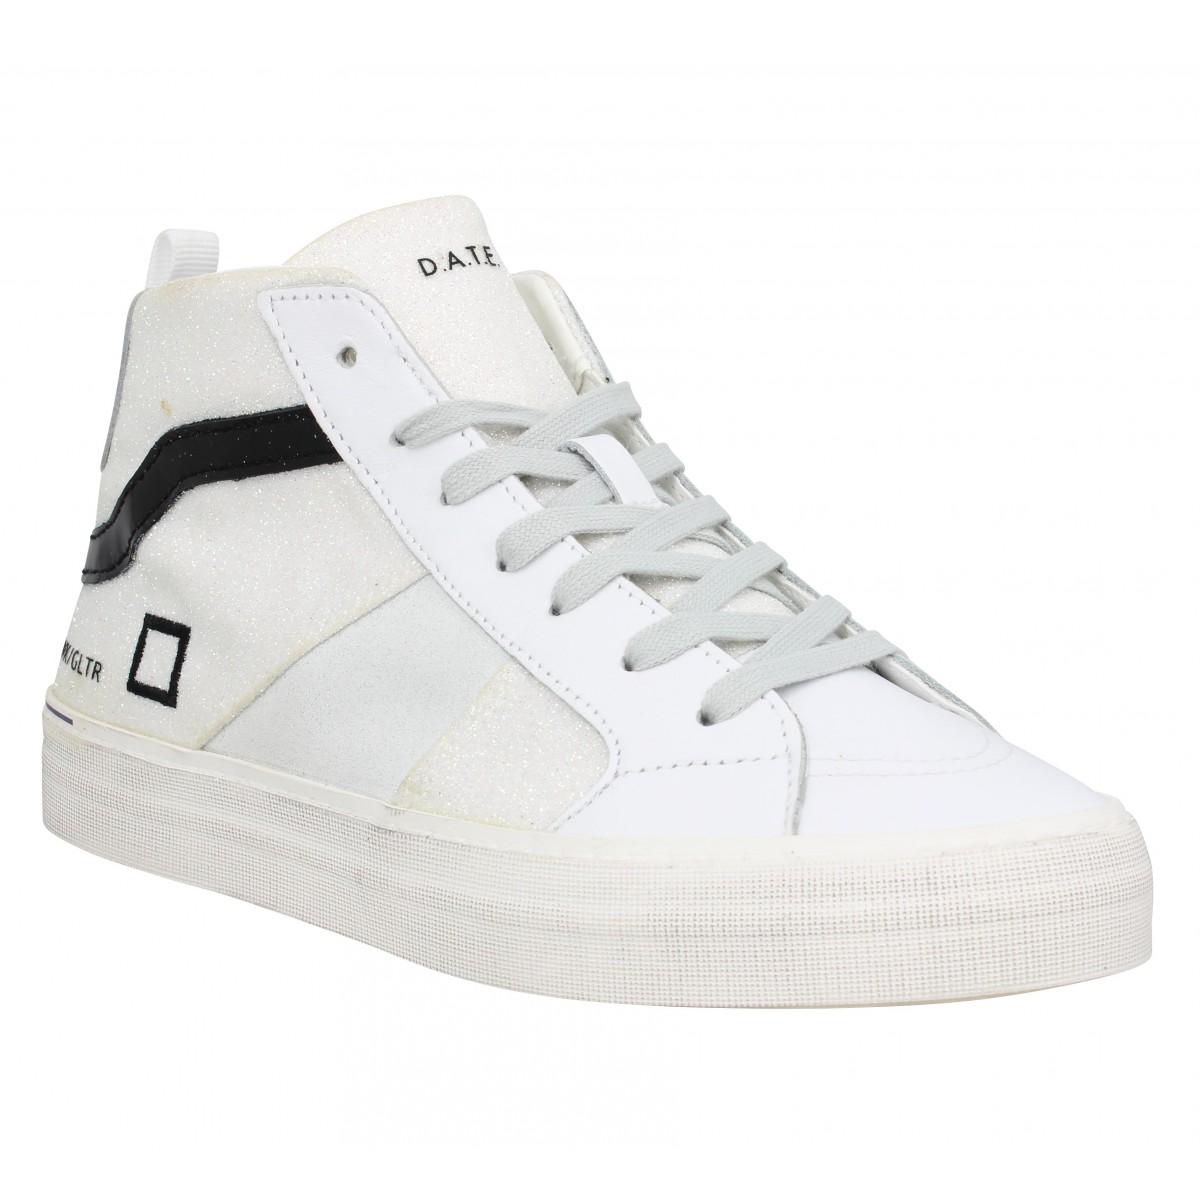 D.A.T.E Marque Date Sneakers Hawk...